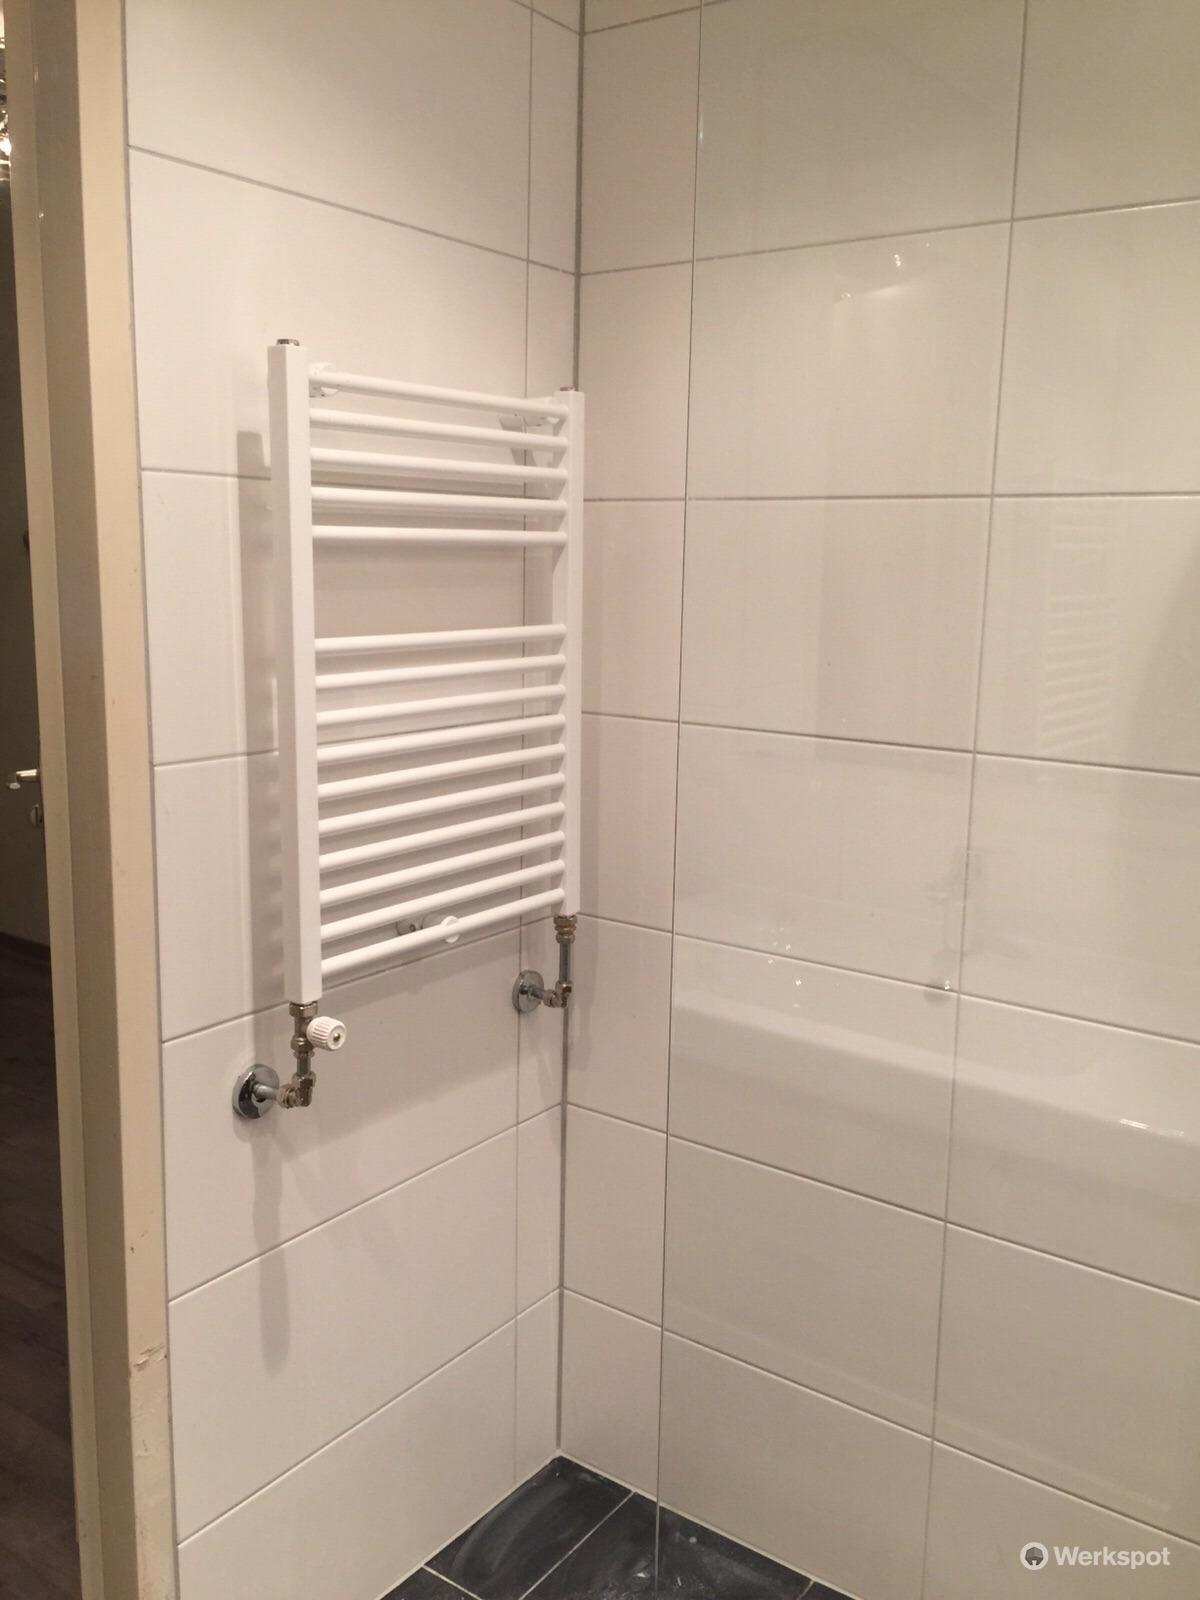 Rotterdam, badkamer 2 x 2 meter - Werkspot